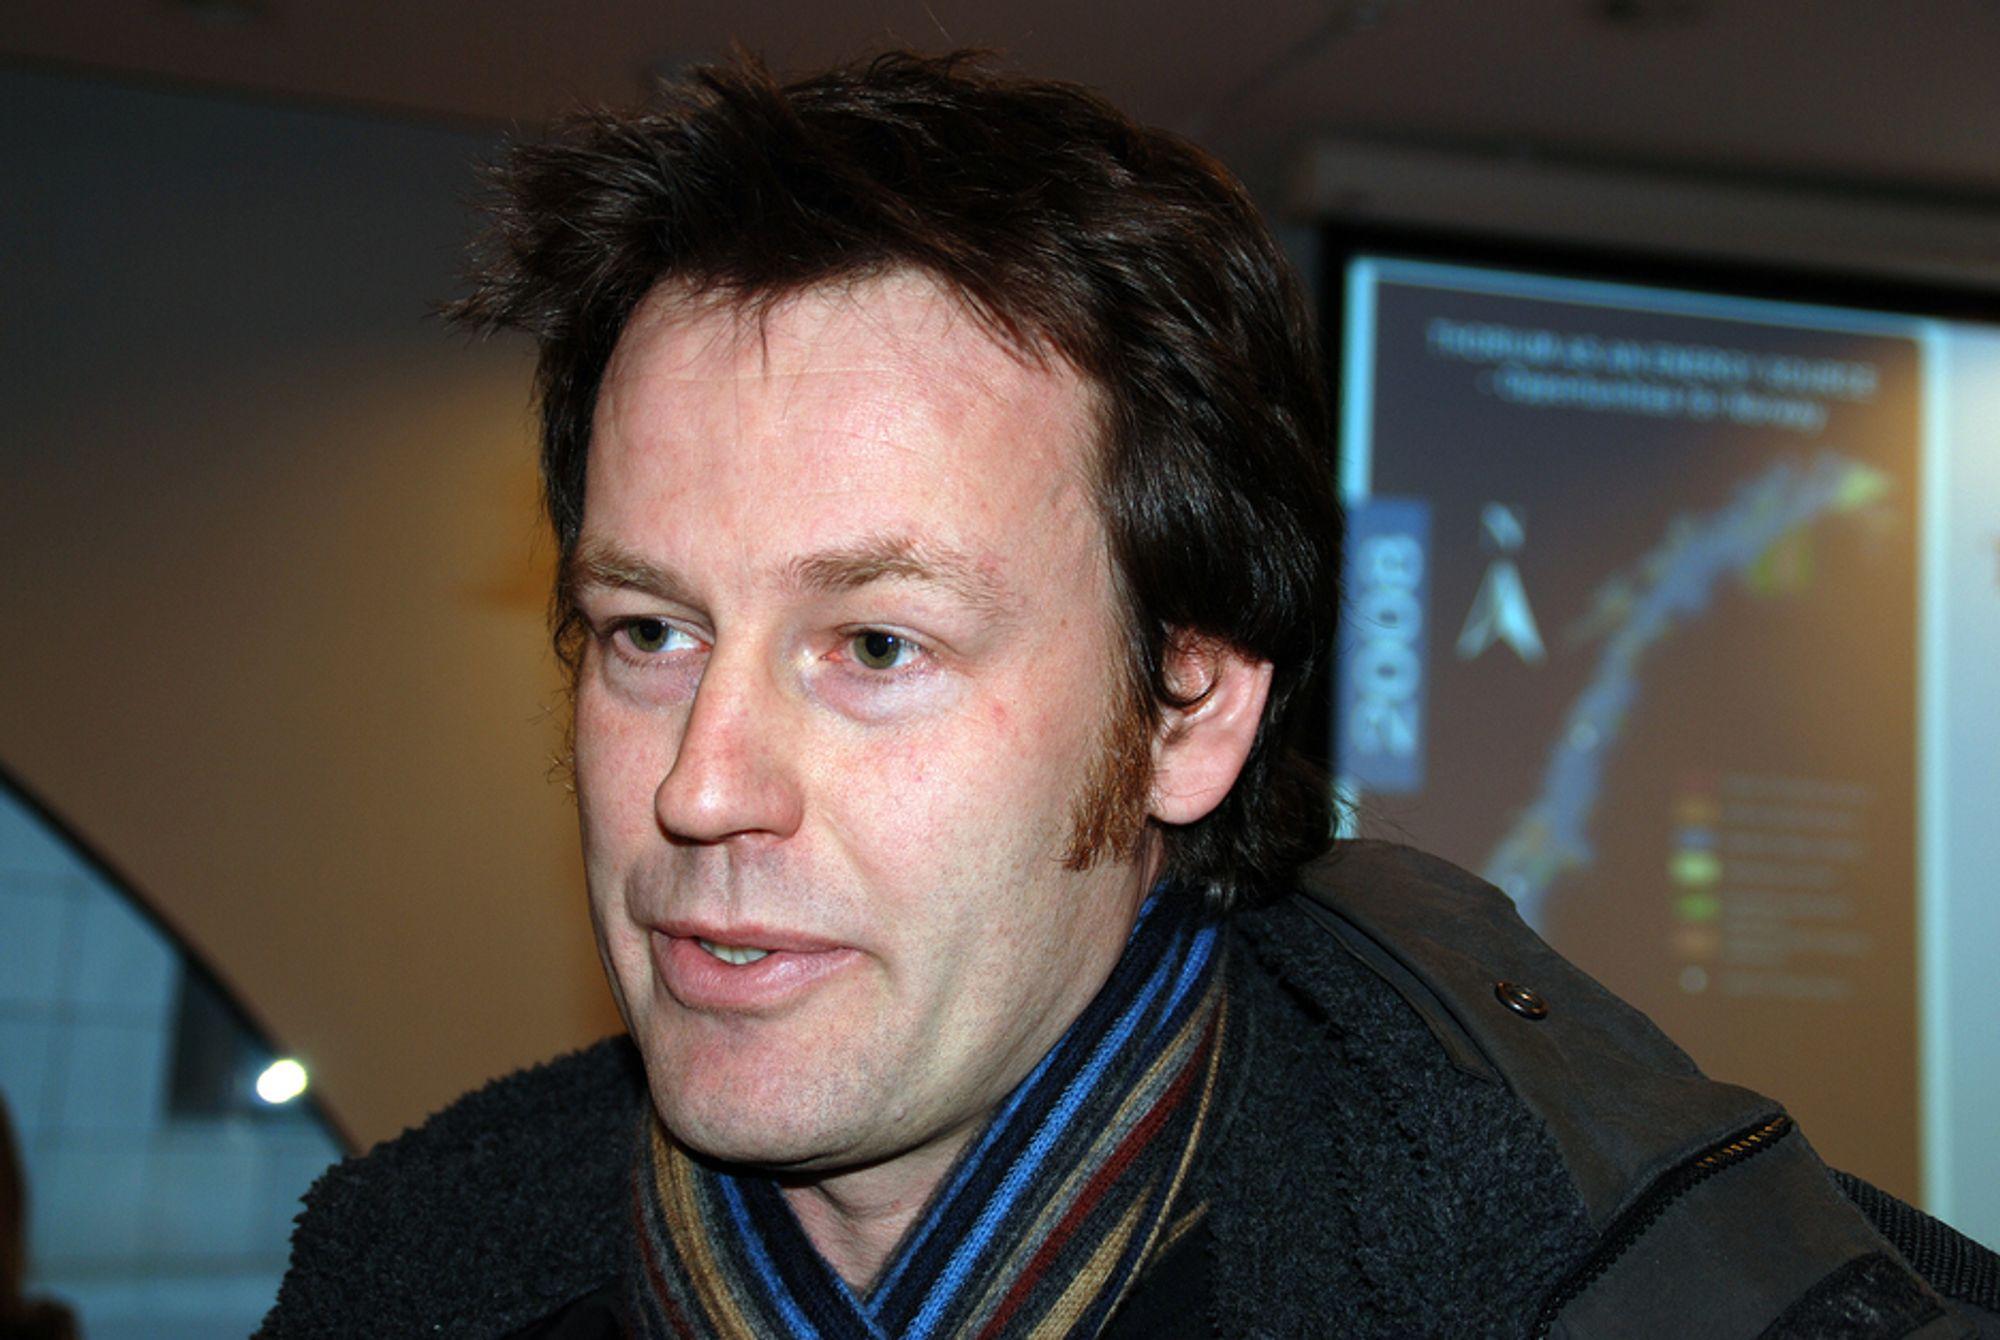 UAKSEPTABELT: Det er uforsvarlig og uakseptabelt å sende norsk høyaktivt atomavfall til Russland, mener atomfysiker Nils Bøhmer i Bellona. Han mener vi bør behandle avfallet i Norge.